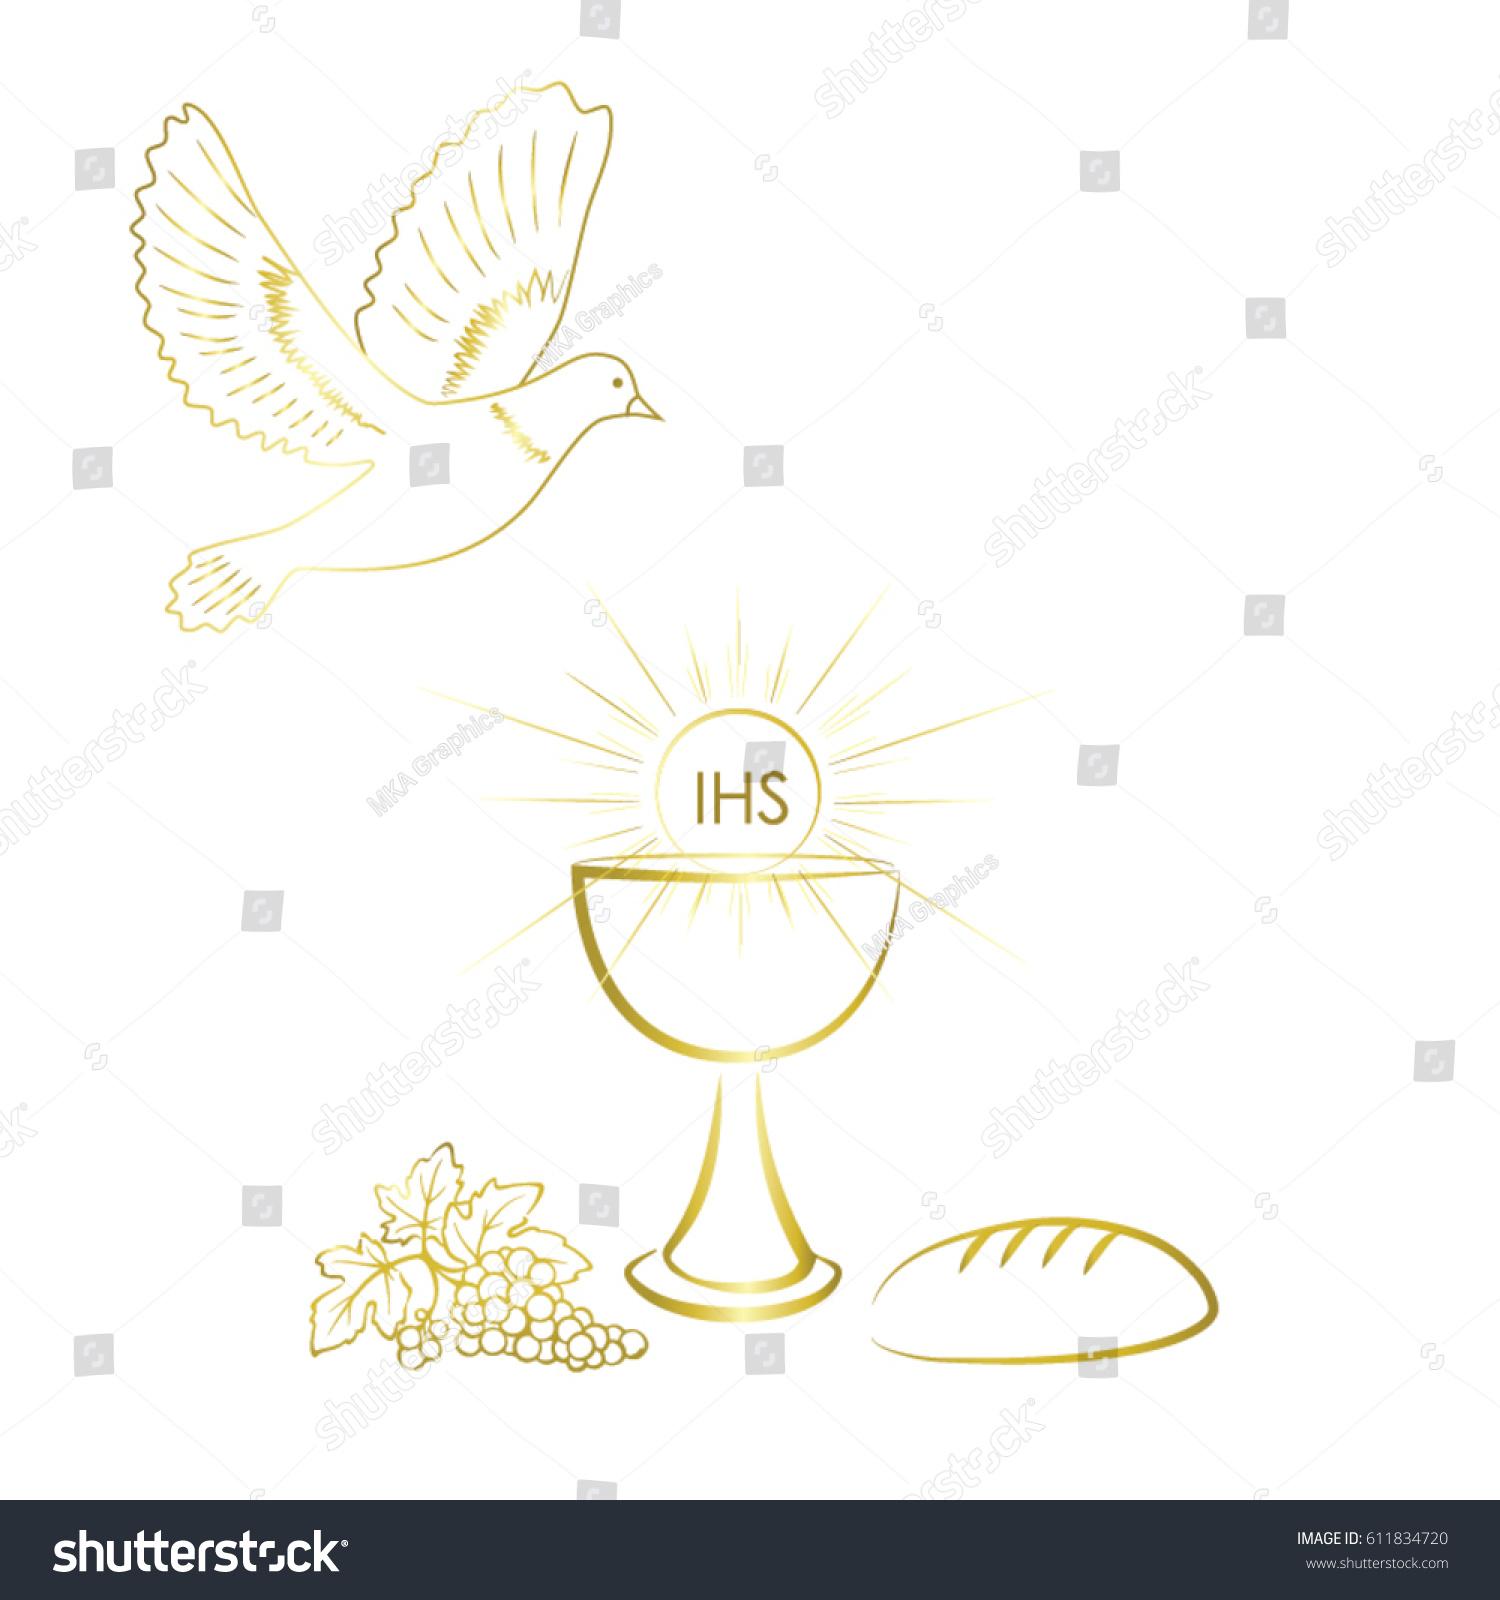 First communion symbols nice invitation design stock vector first communion symbols for a nice invitation design buycottarizona Image collections